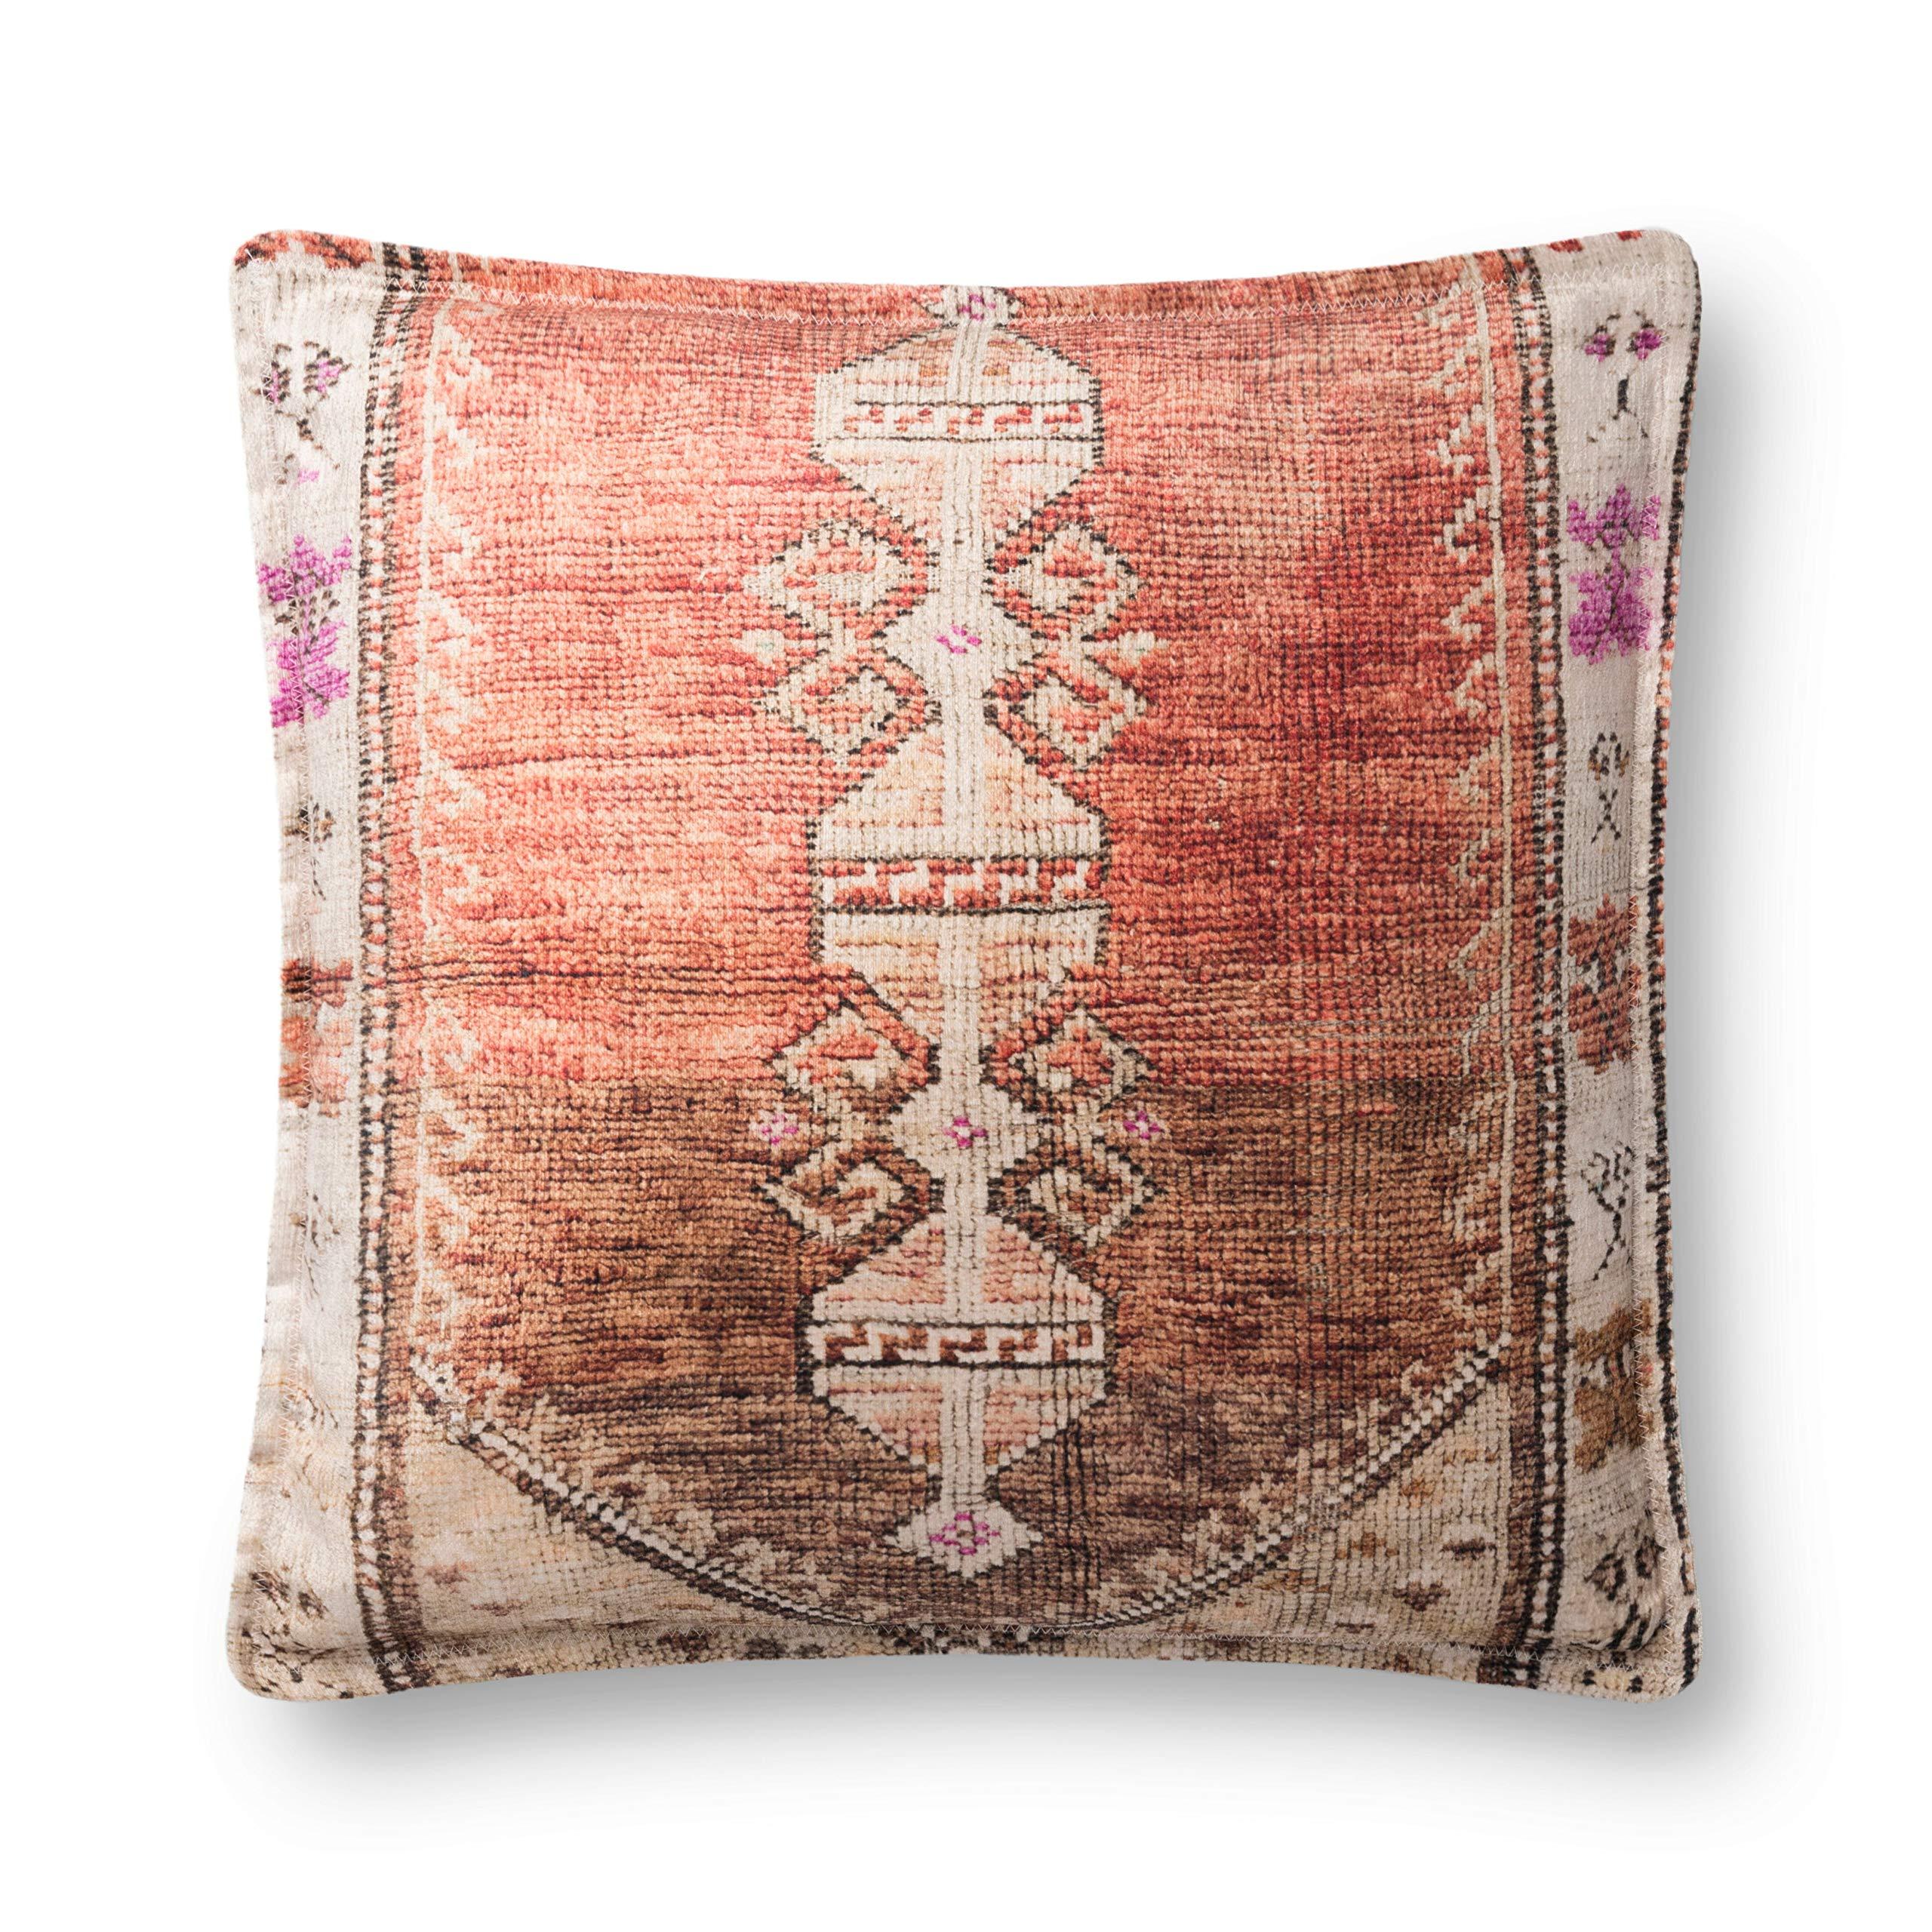 Loloi Decorative Pillow, Rust/Multi by Loloi